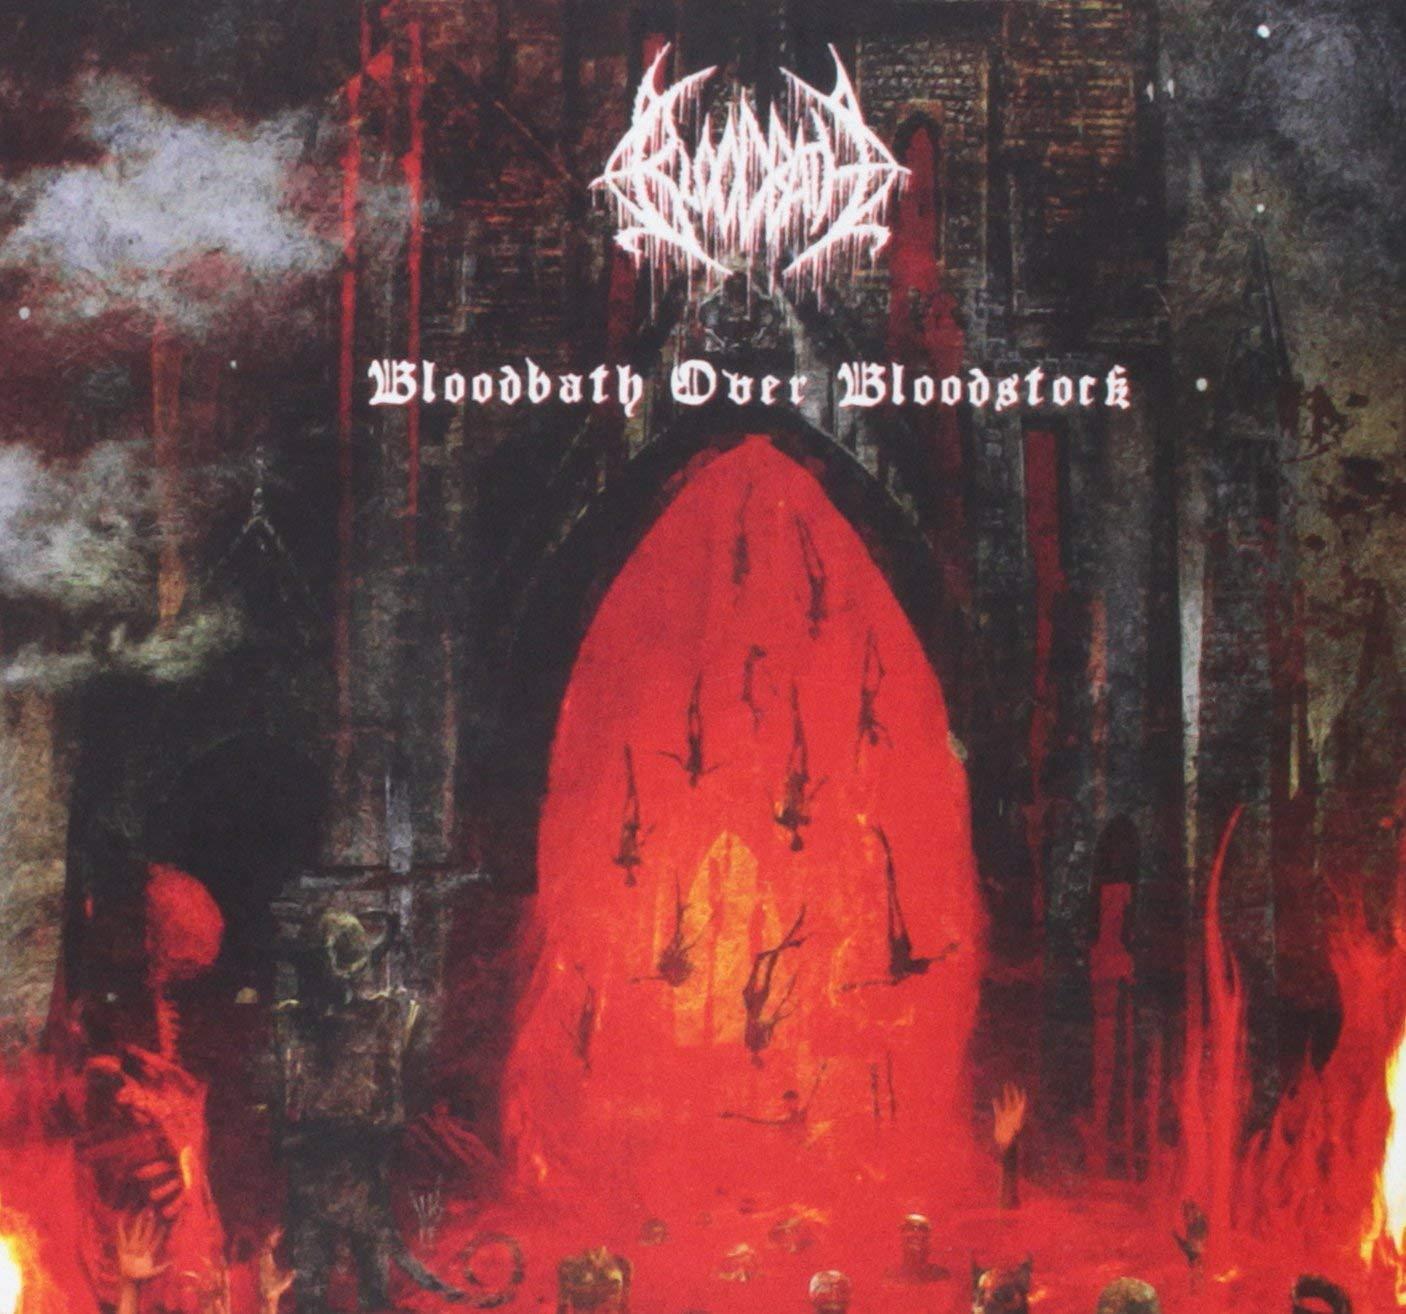 Bloodbath. Bloodbath Over Bloodstock (2 CD + DVD)